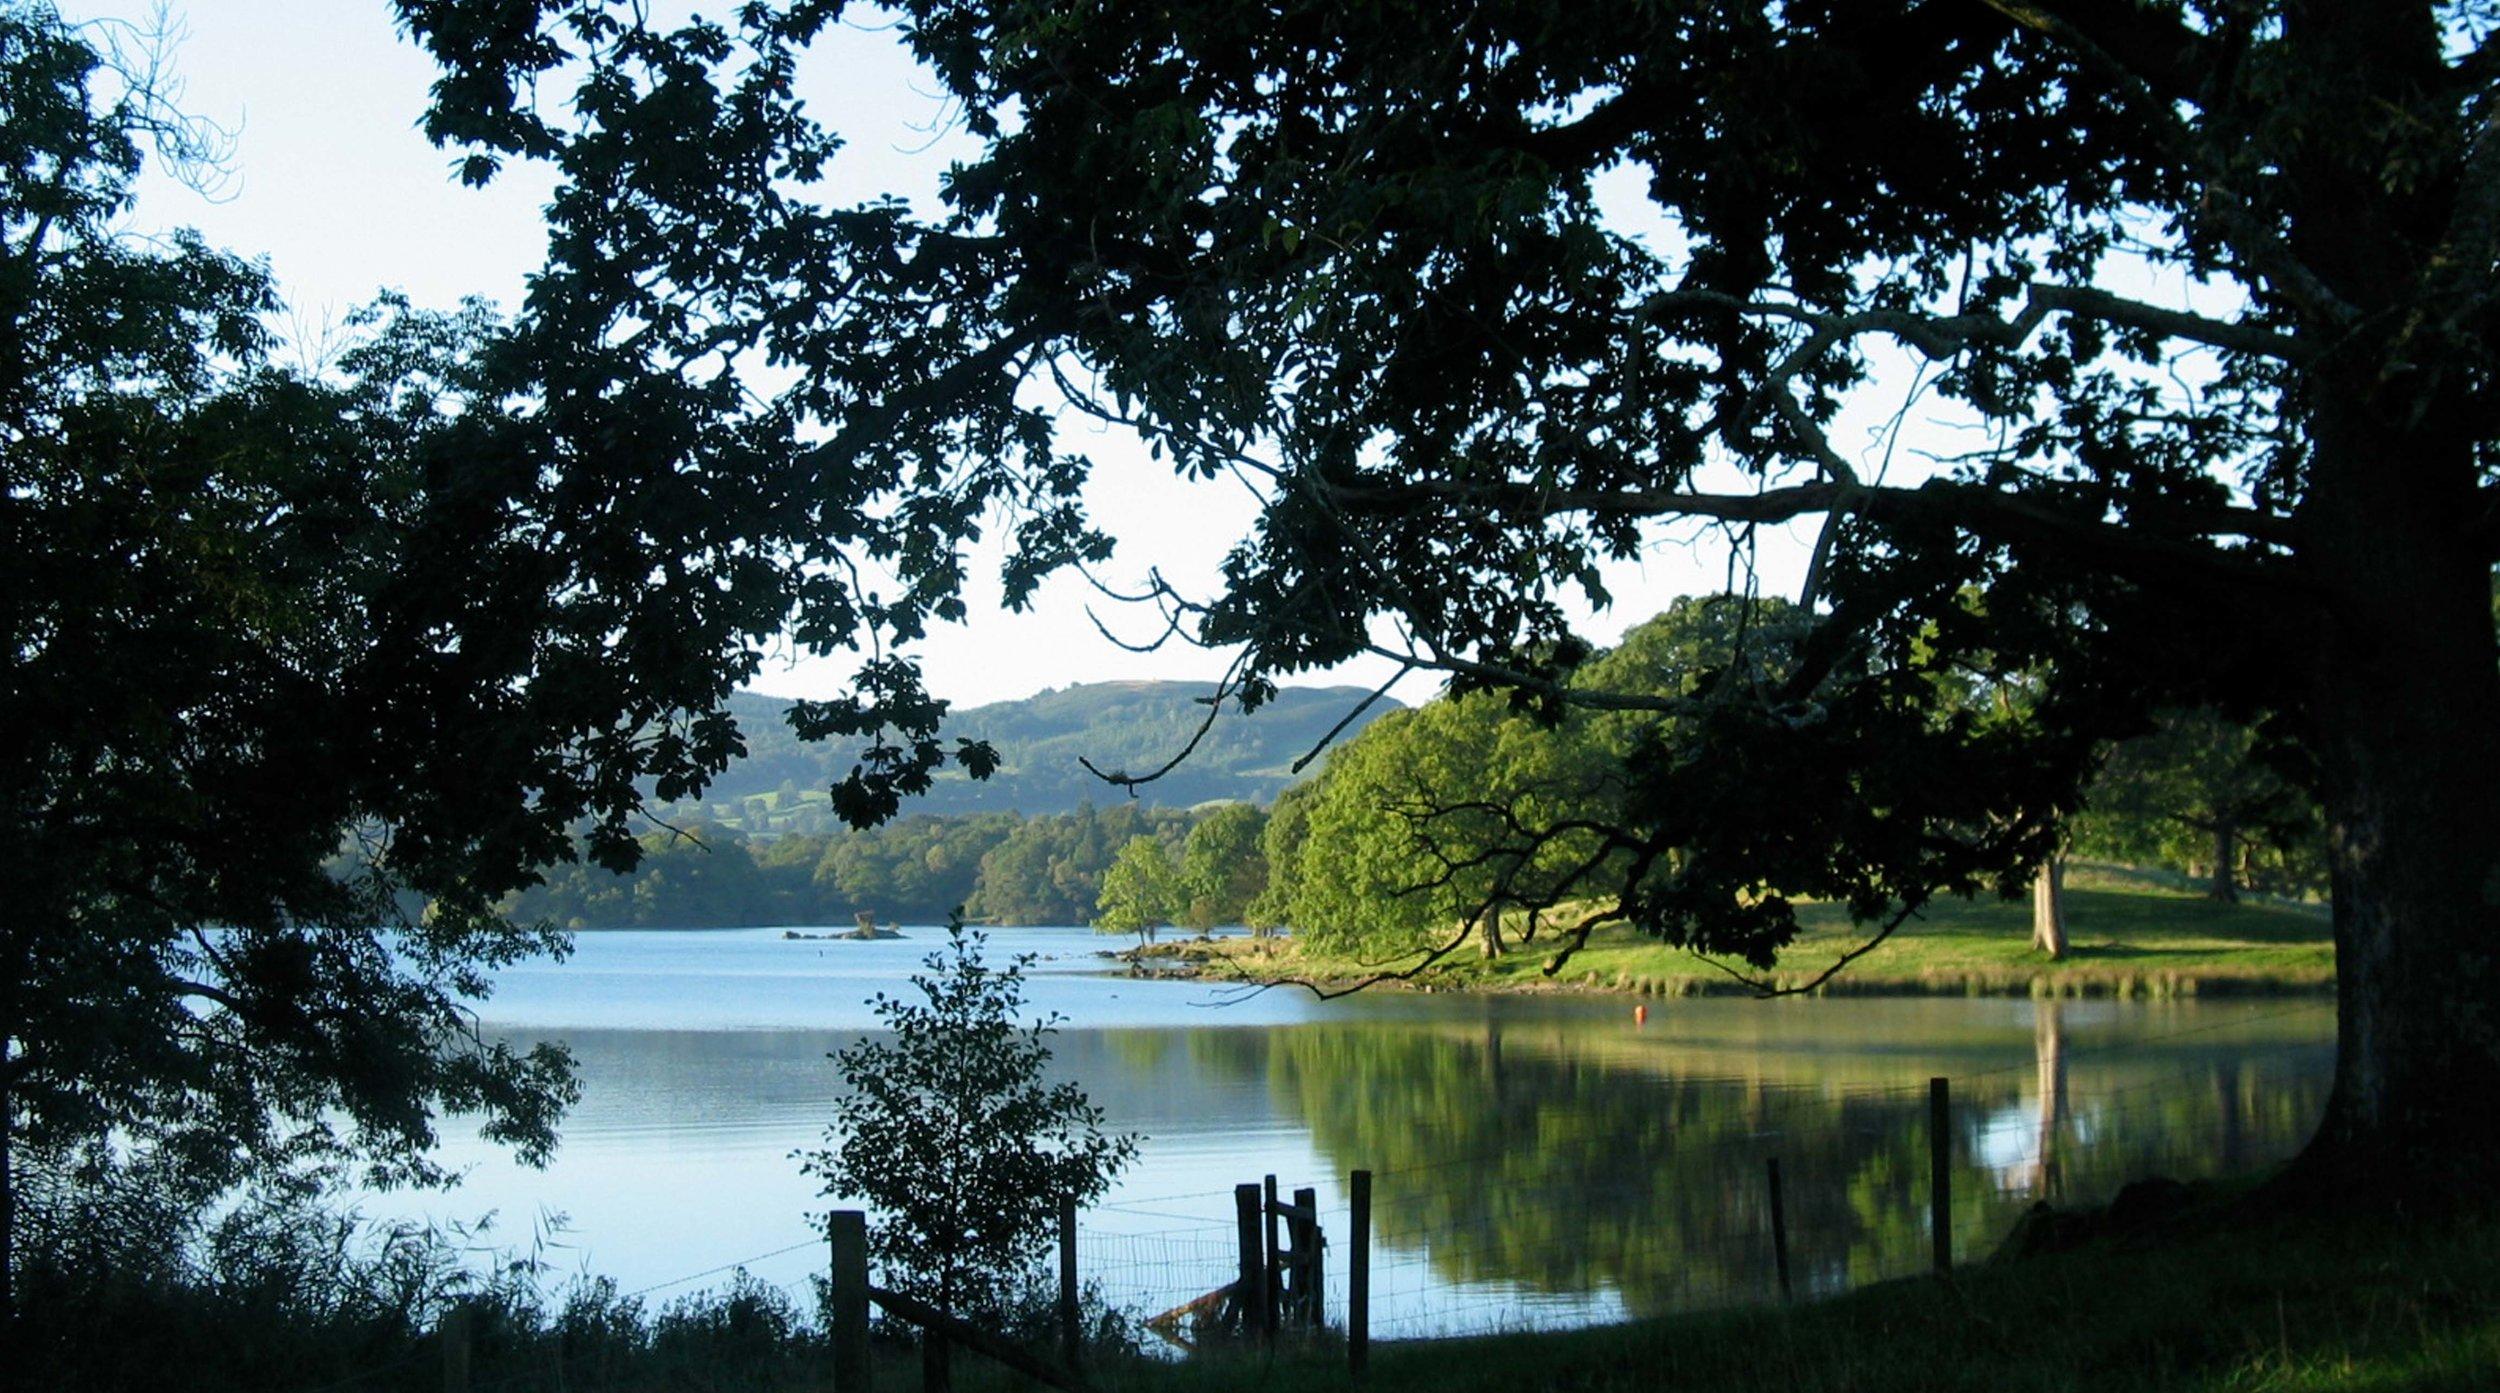 Lake-Windermere-through-the-trees-on-the-Brathay-estate.jpg